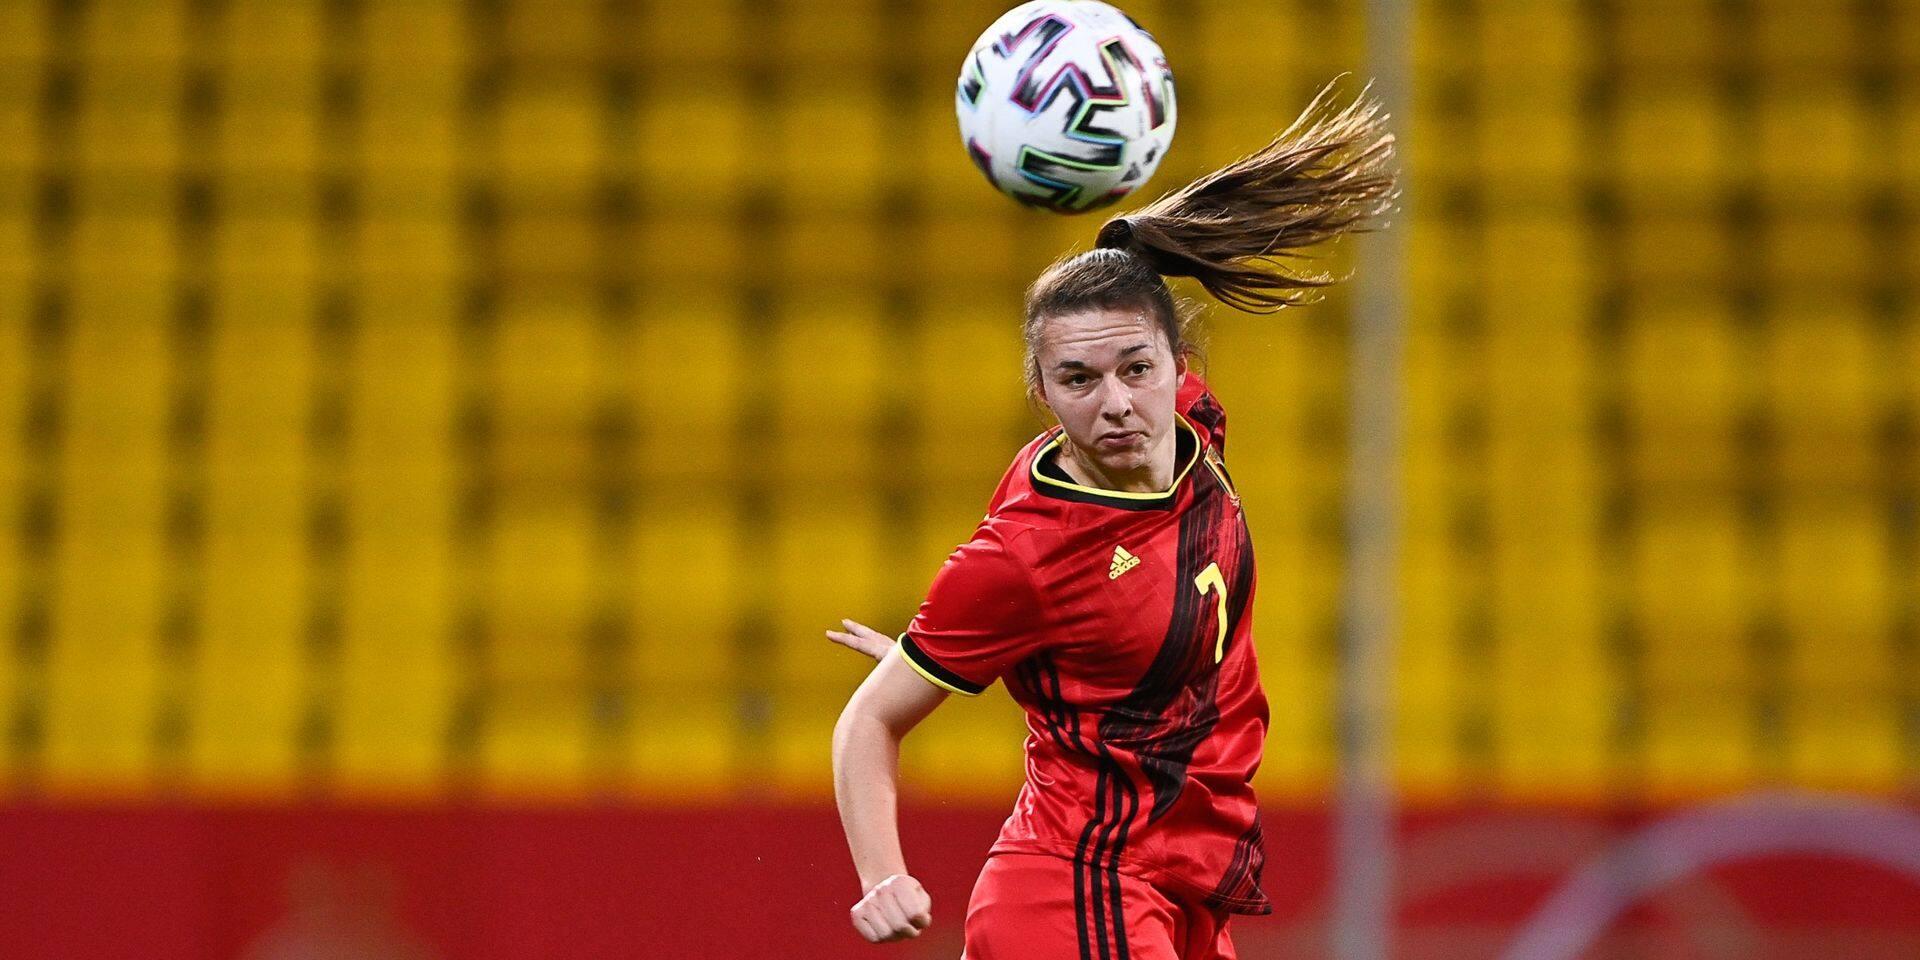 Red Flames: Jody Vangheluwe et Ella Van Kerkhoven quittent le groupe avant la Norvège et l'Irlande